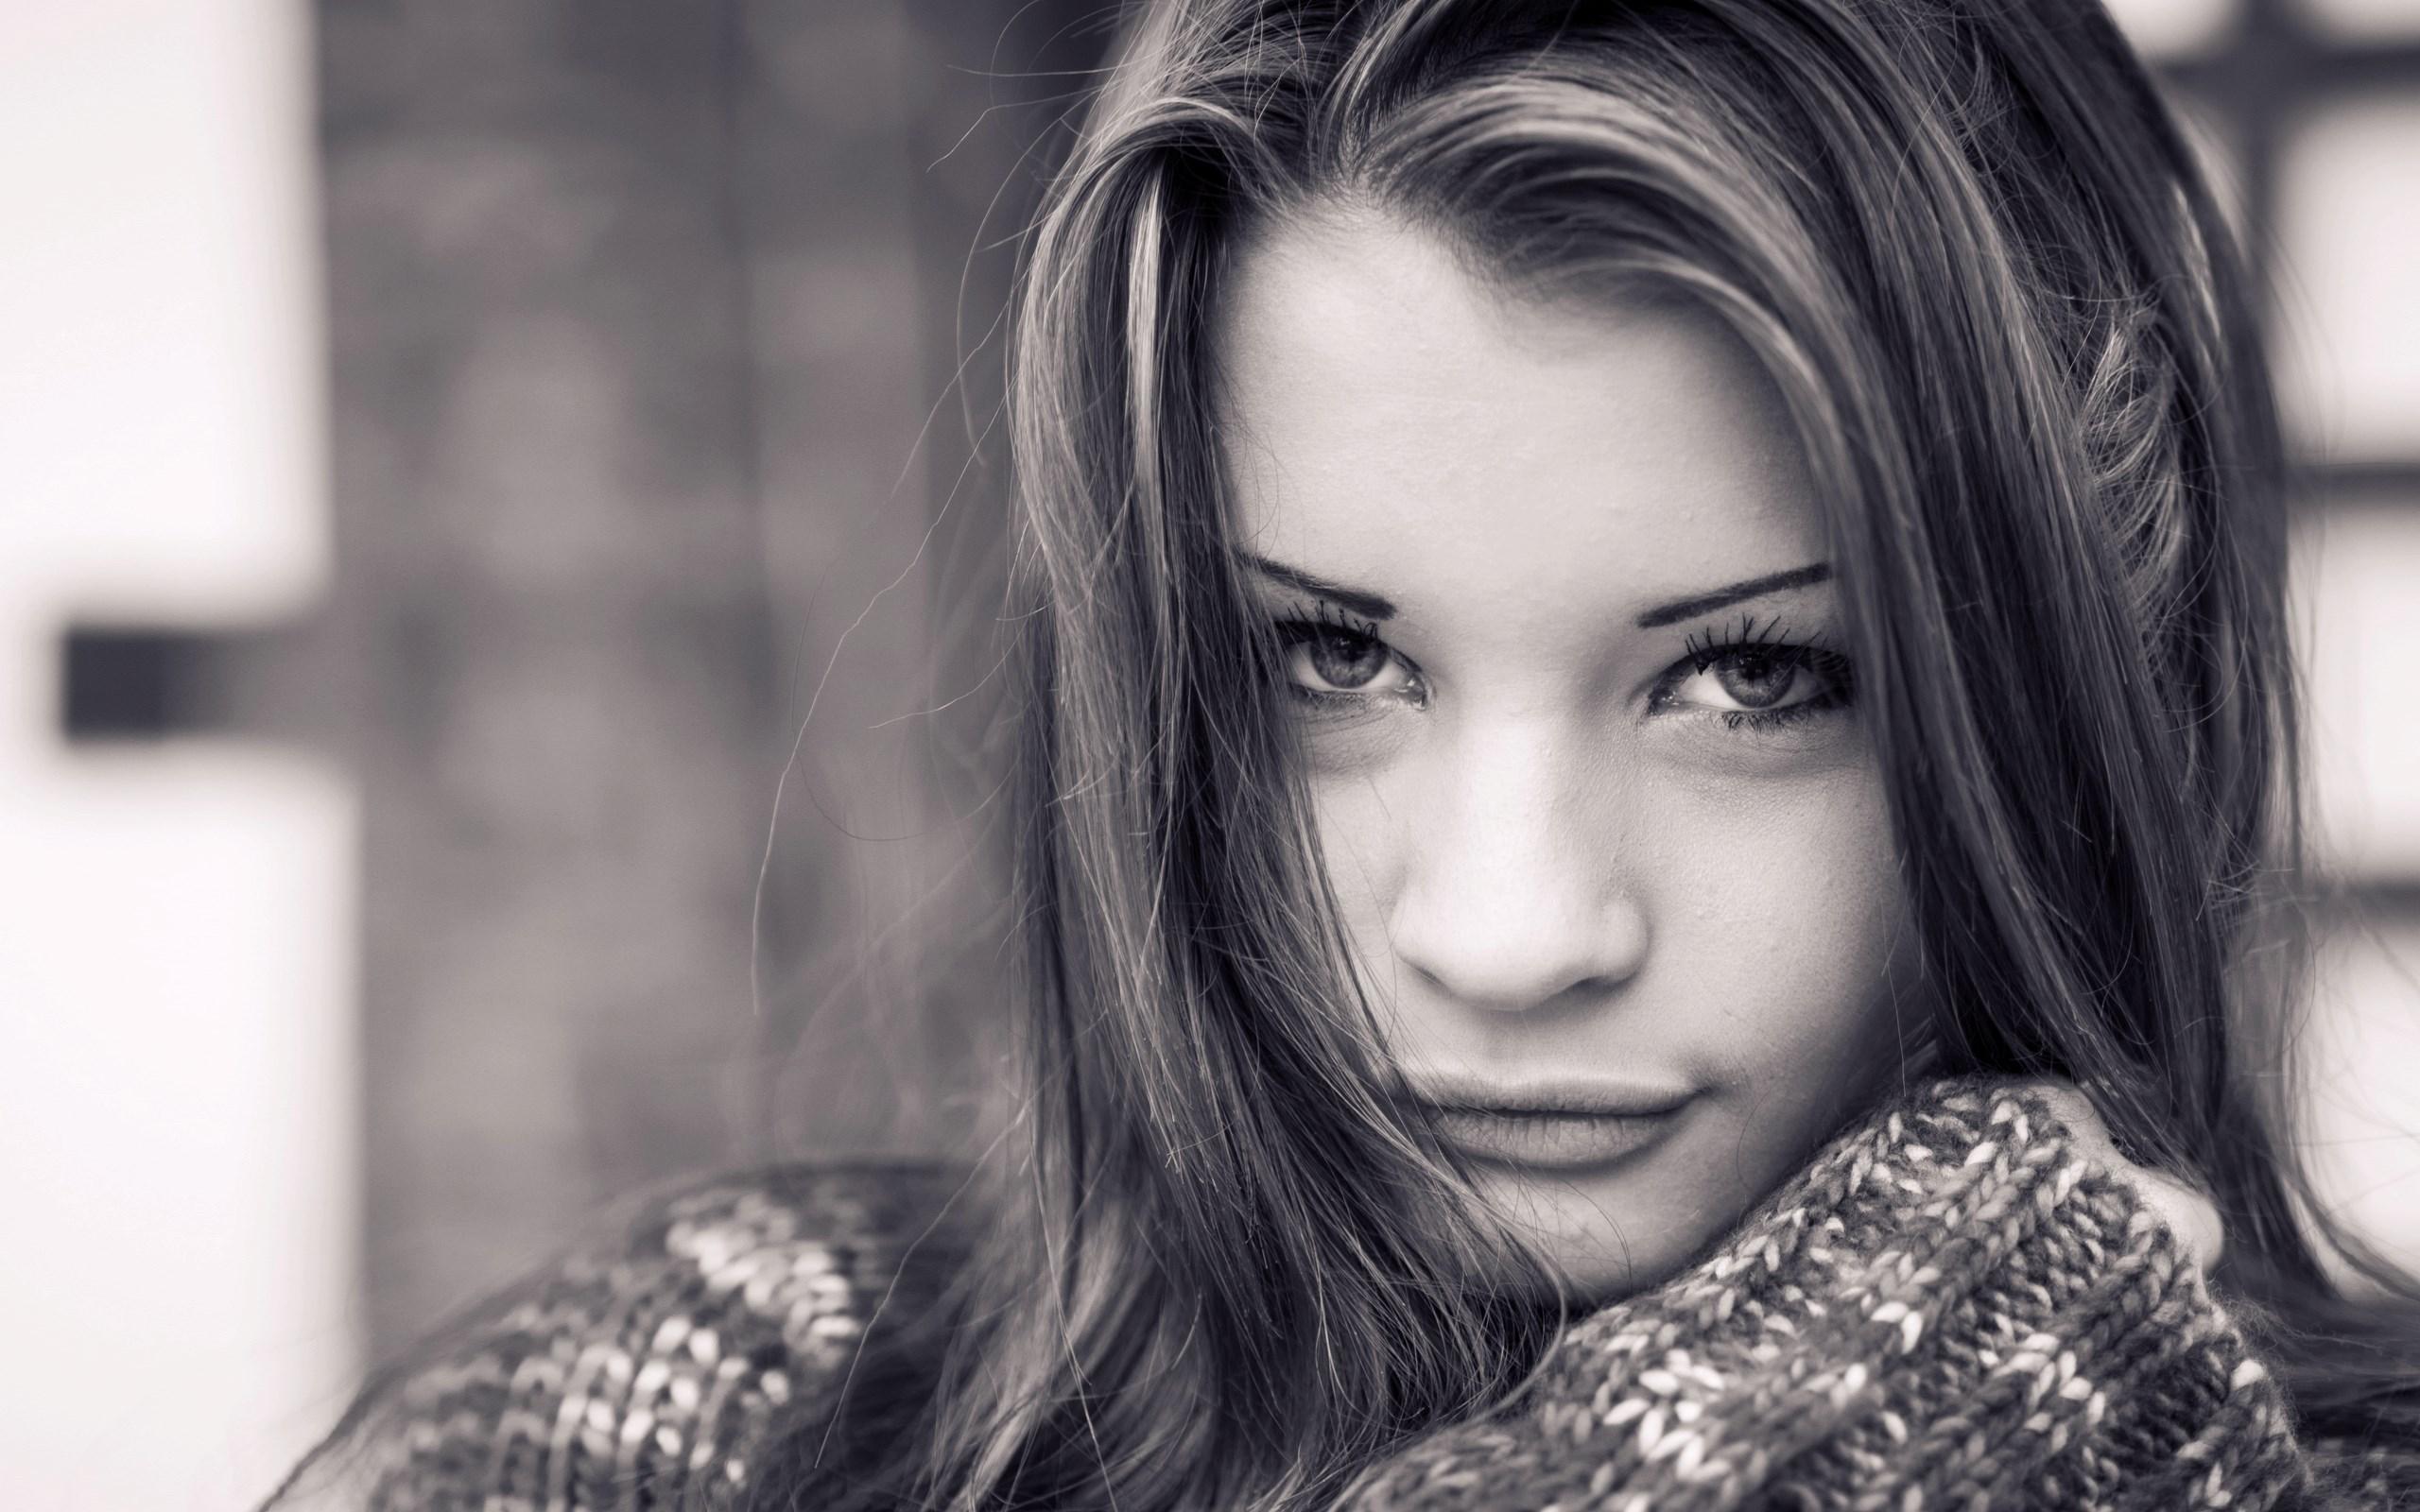 Beautiful Portrait Girl Photo